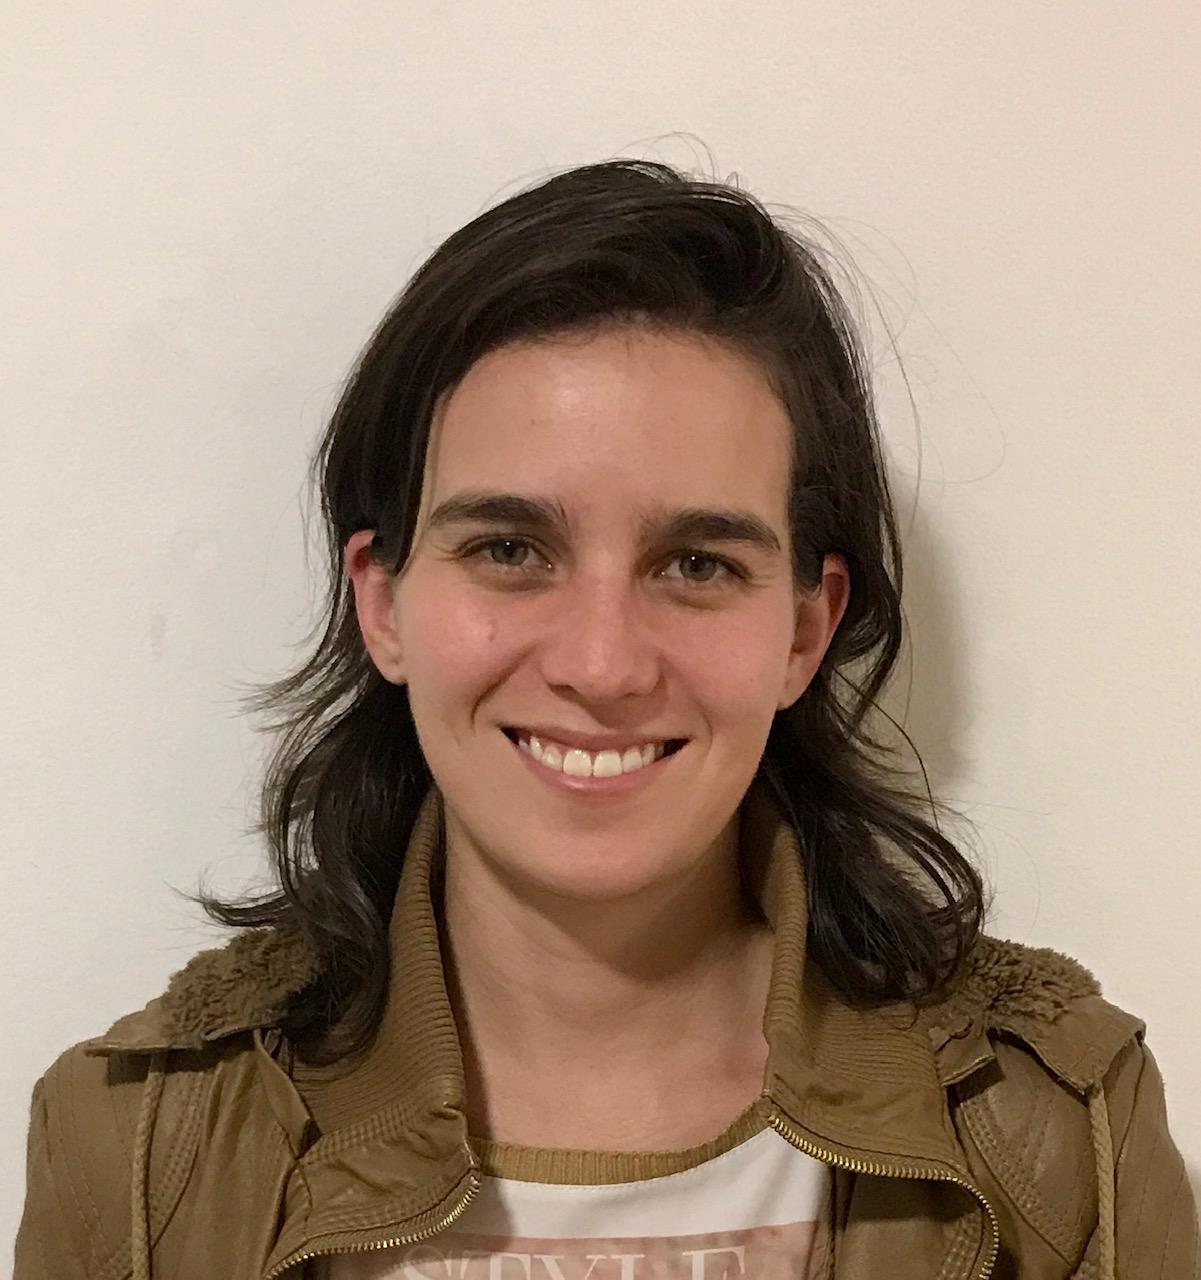 Andrea, estudiante de piano de TUTEMPO academia musical